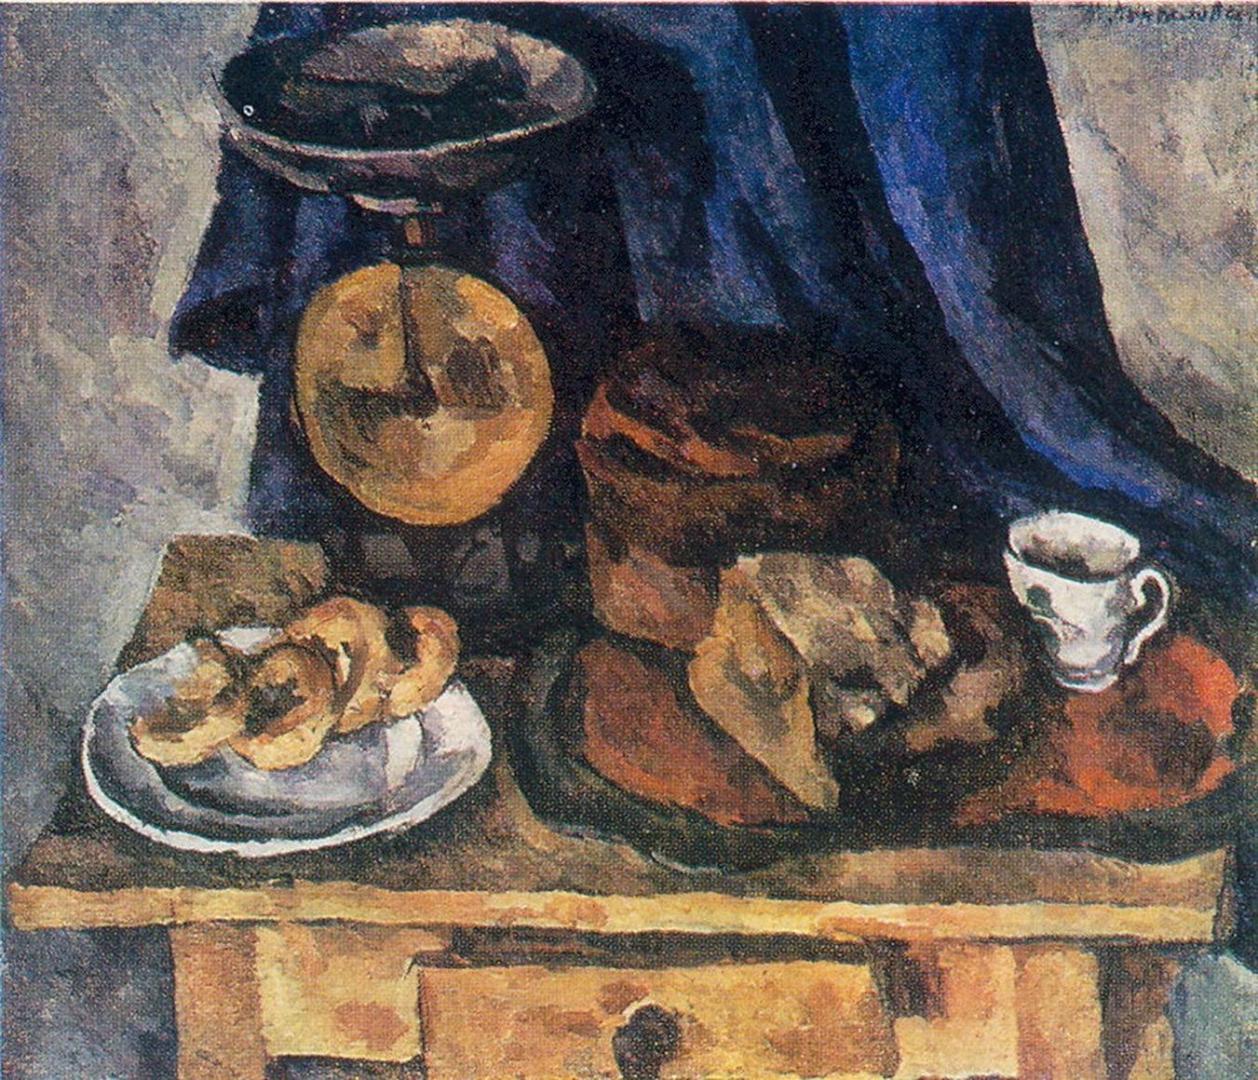 Петр Кончаловский. Хлебы. 1920